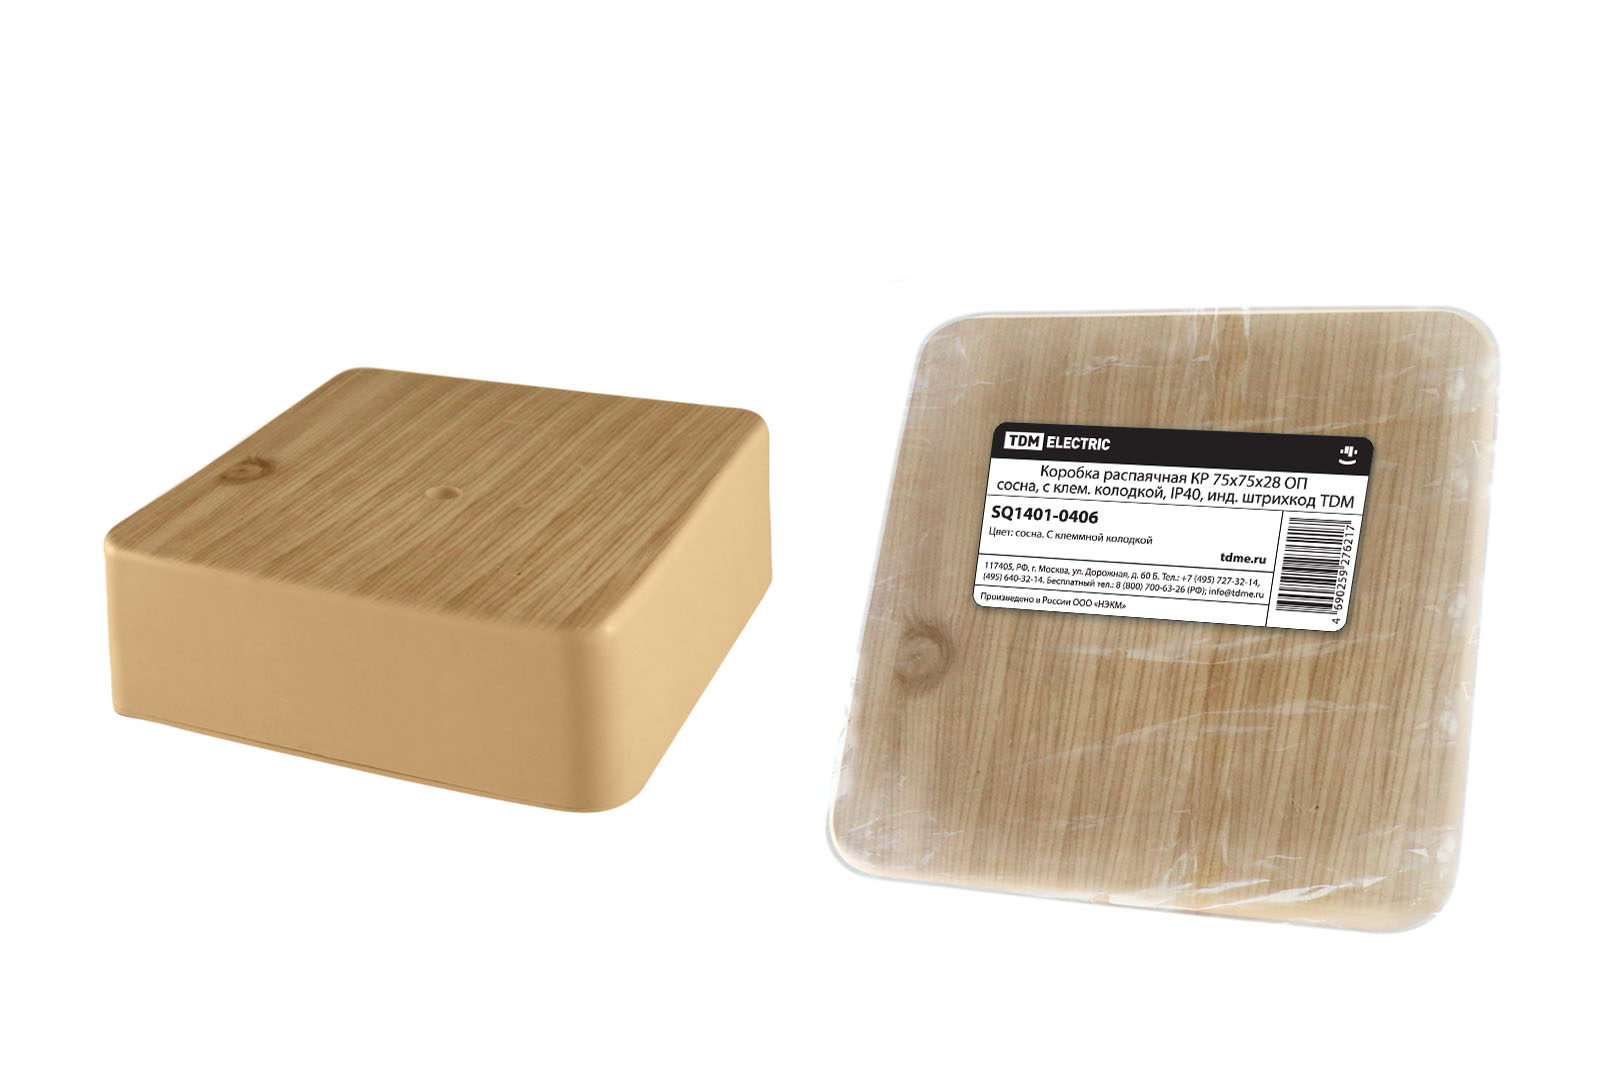 Фото Коробка распаячная КР 75х75х28 ОП сосна, с клем. колодкой, IP40, инд. штрихкод TDM {SQ1401-0406}